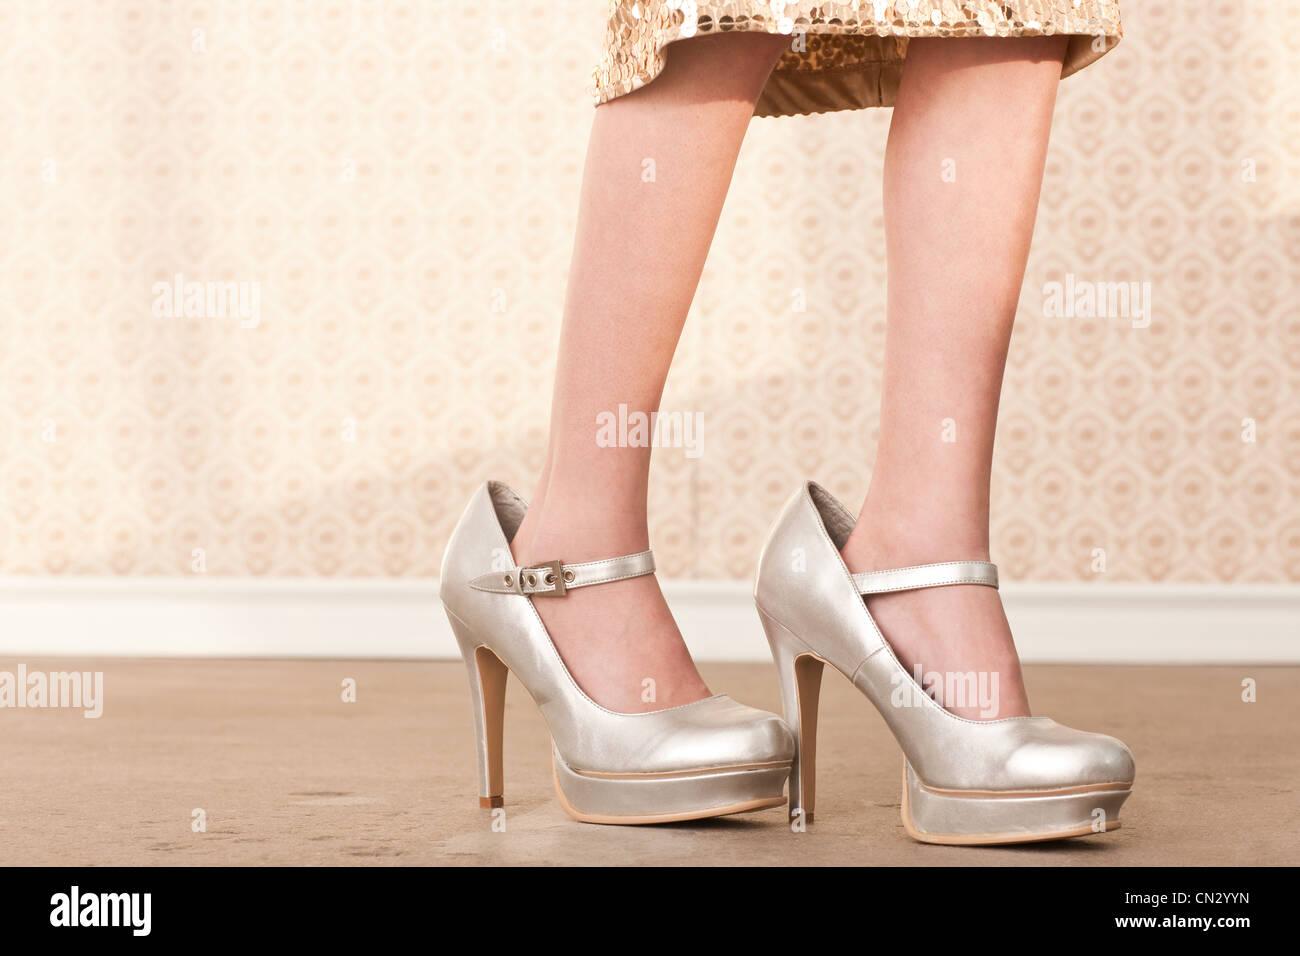 Sa mère Girl wearing High heels Photo Stock